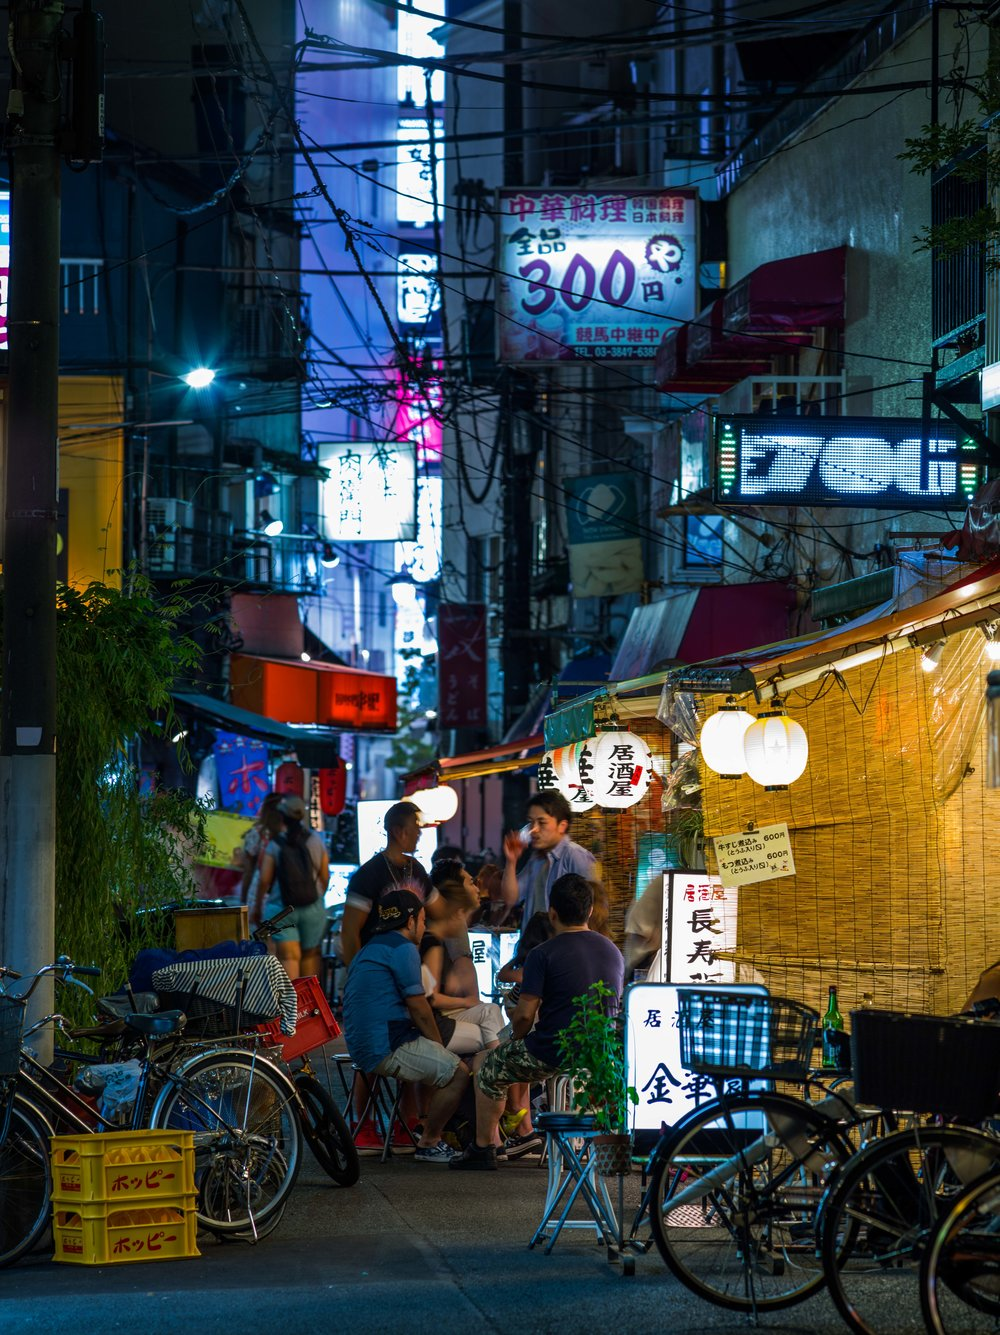 asakusa-street-photography_P640840.jpg